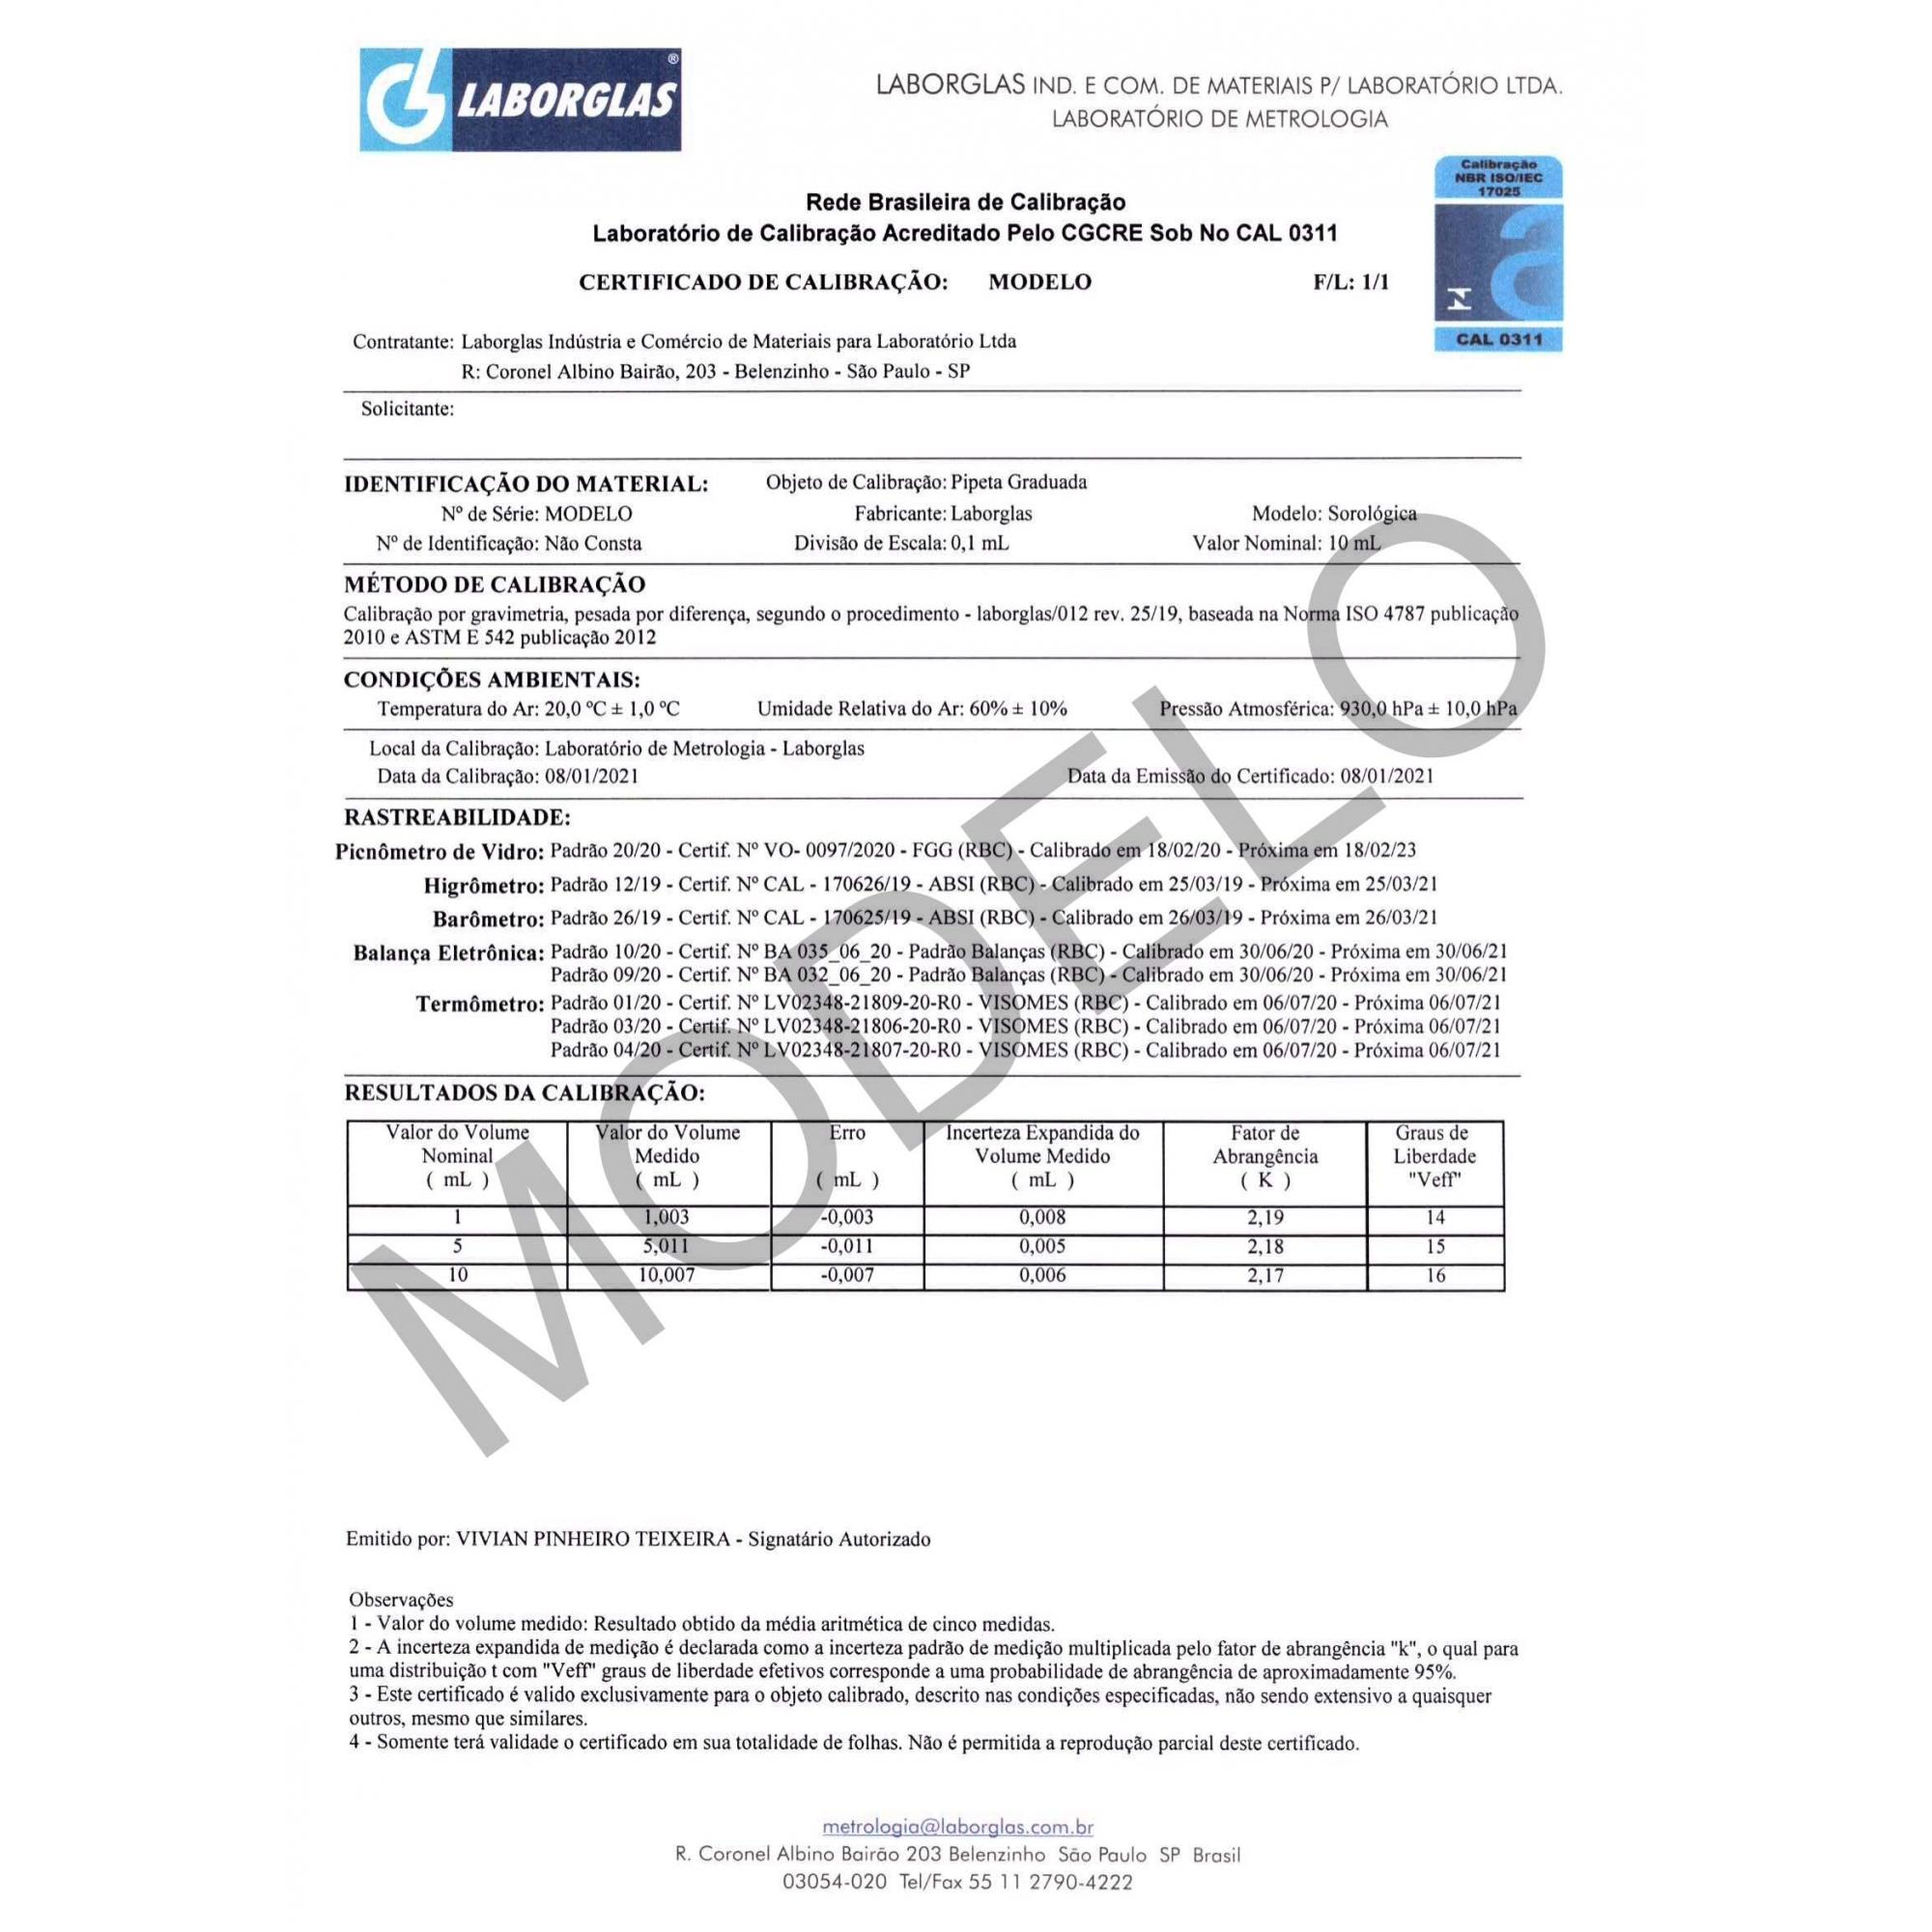 PIPETA GRAD. SOROL. ESGOT. TOTAL 20 ML 1/10 COM CERTIFICADO RBC - Laborglas - Cód. 9434312-R